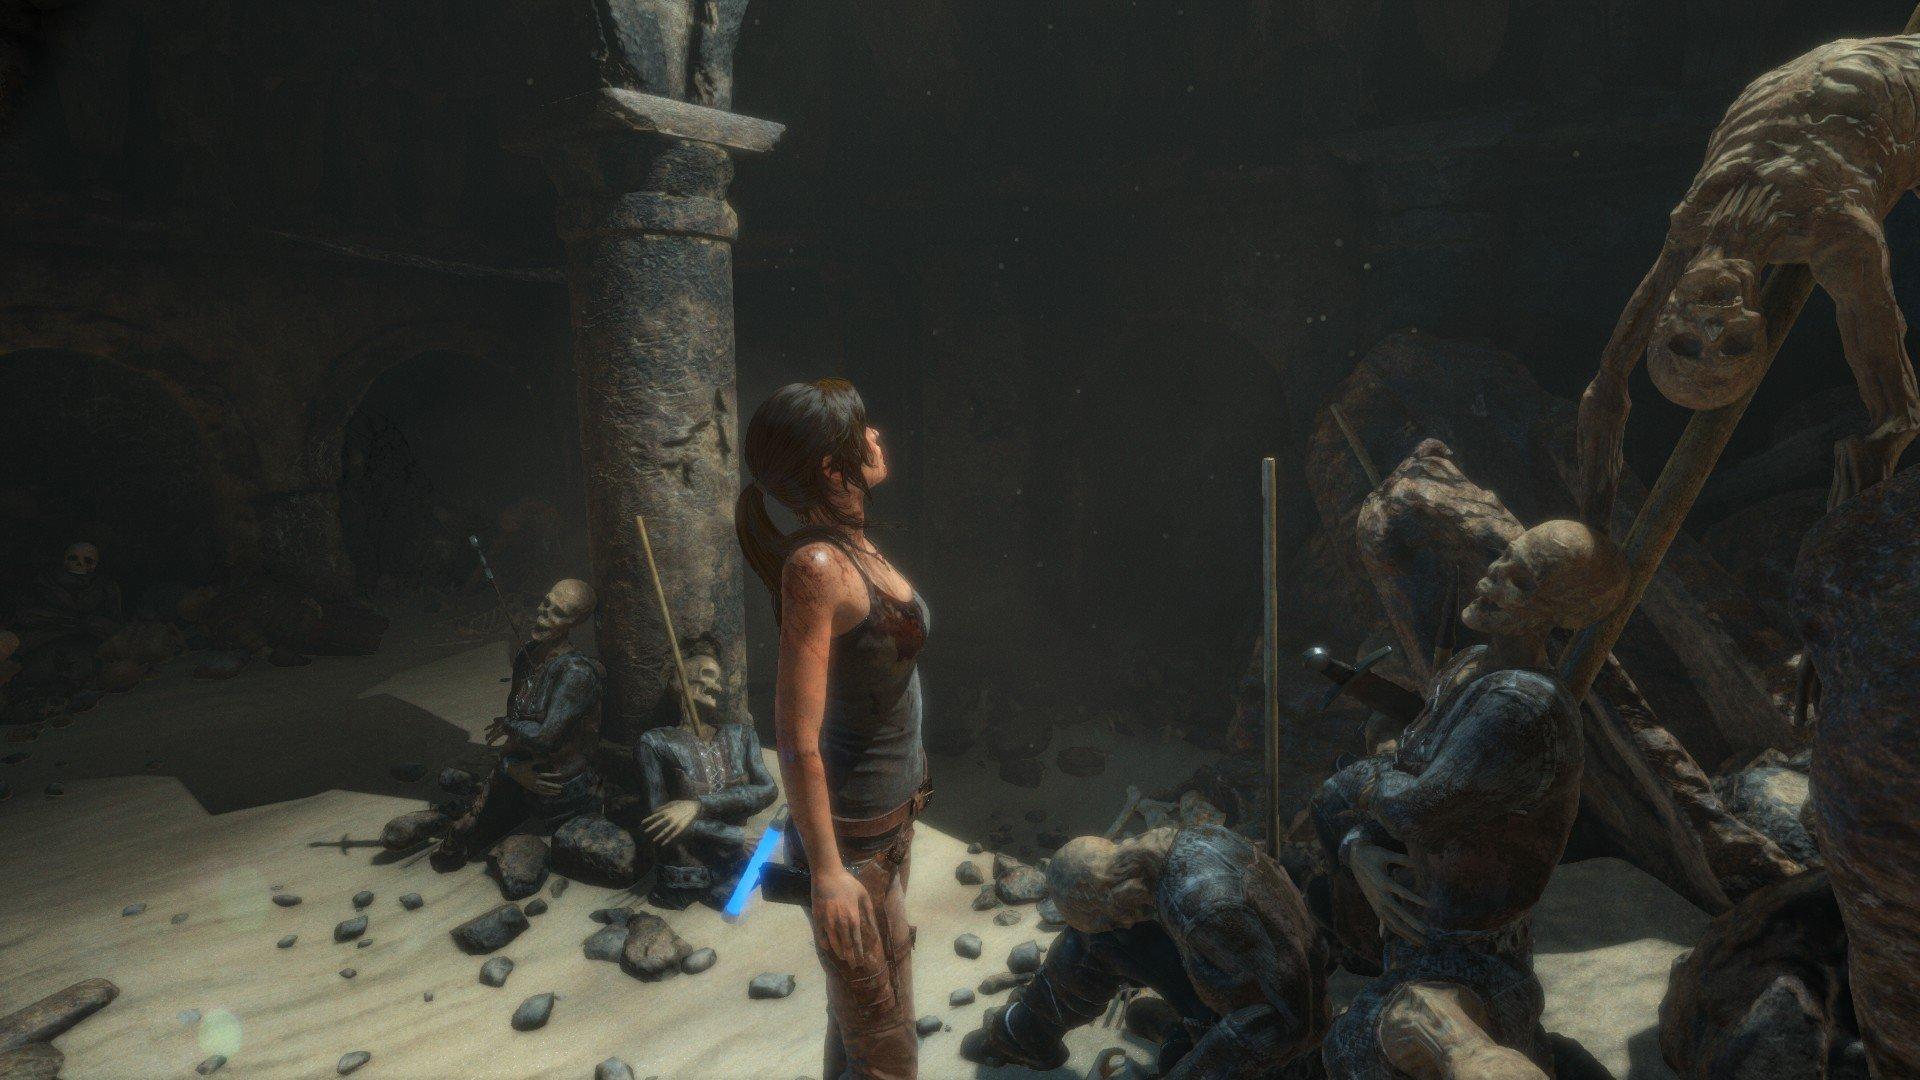 Rise of the Tomb Raider или да когда же этот медведь сдохнет?. - Изображение 29